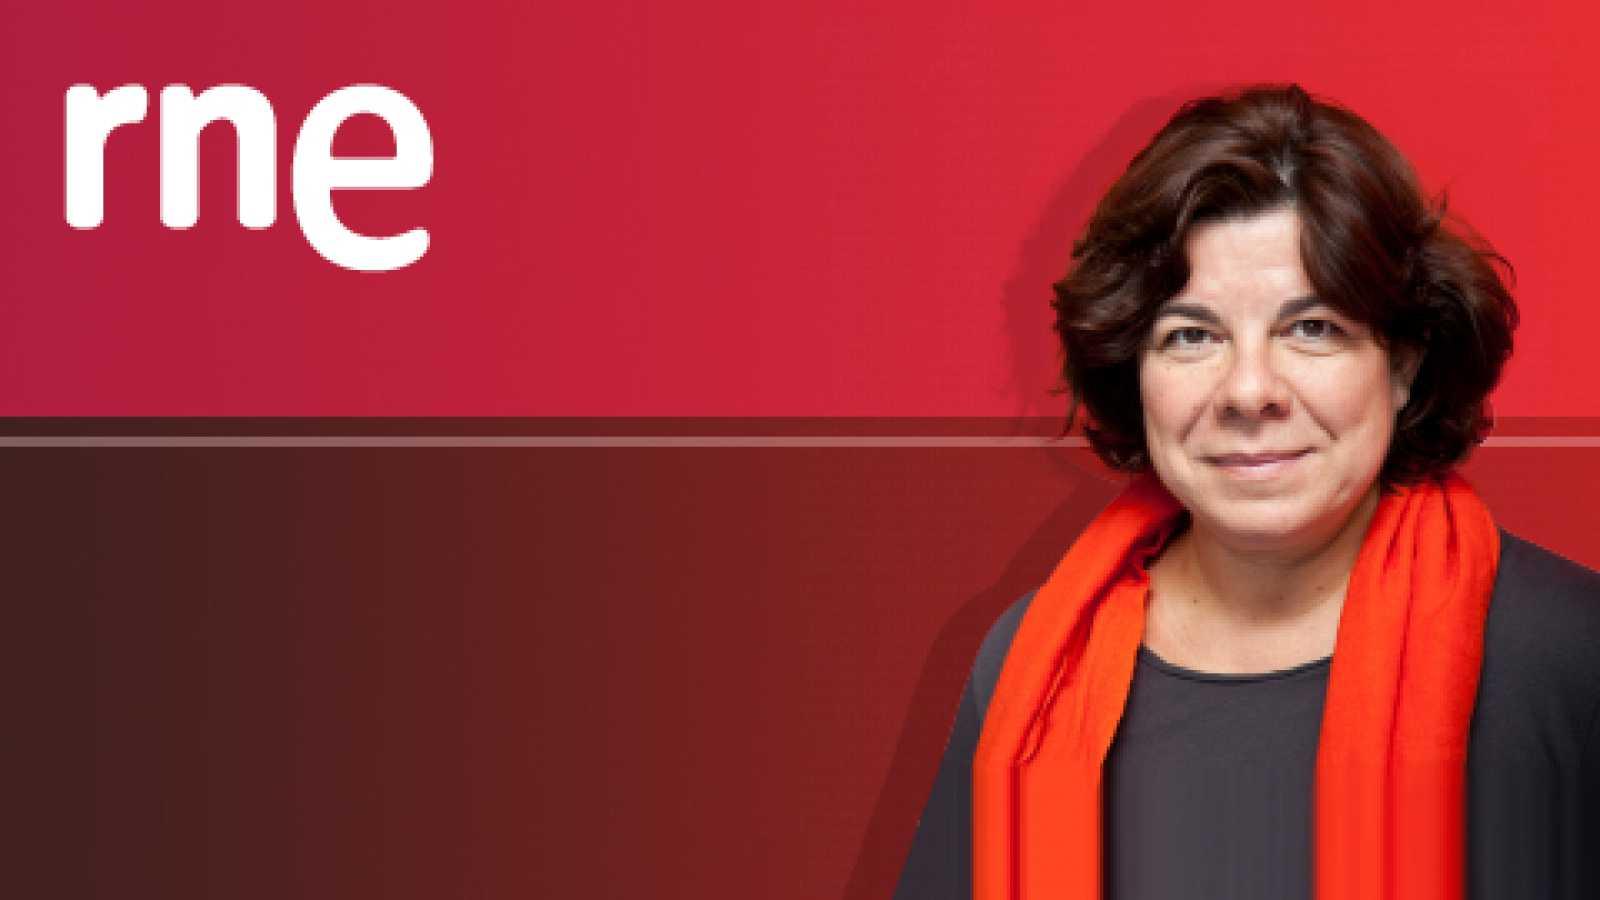 Siluetas - Ángeles González-Sinde - 19/01/14 - escuchar ahora